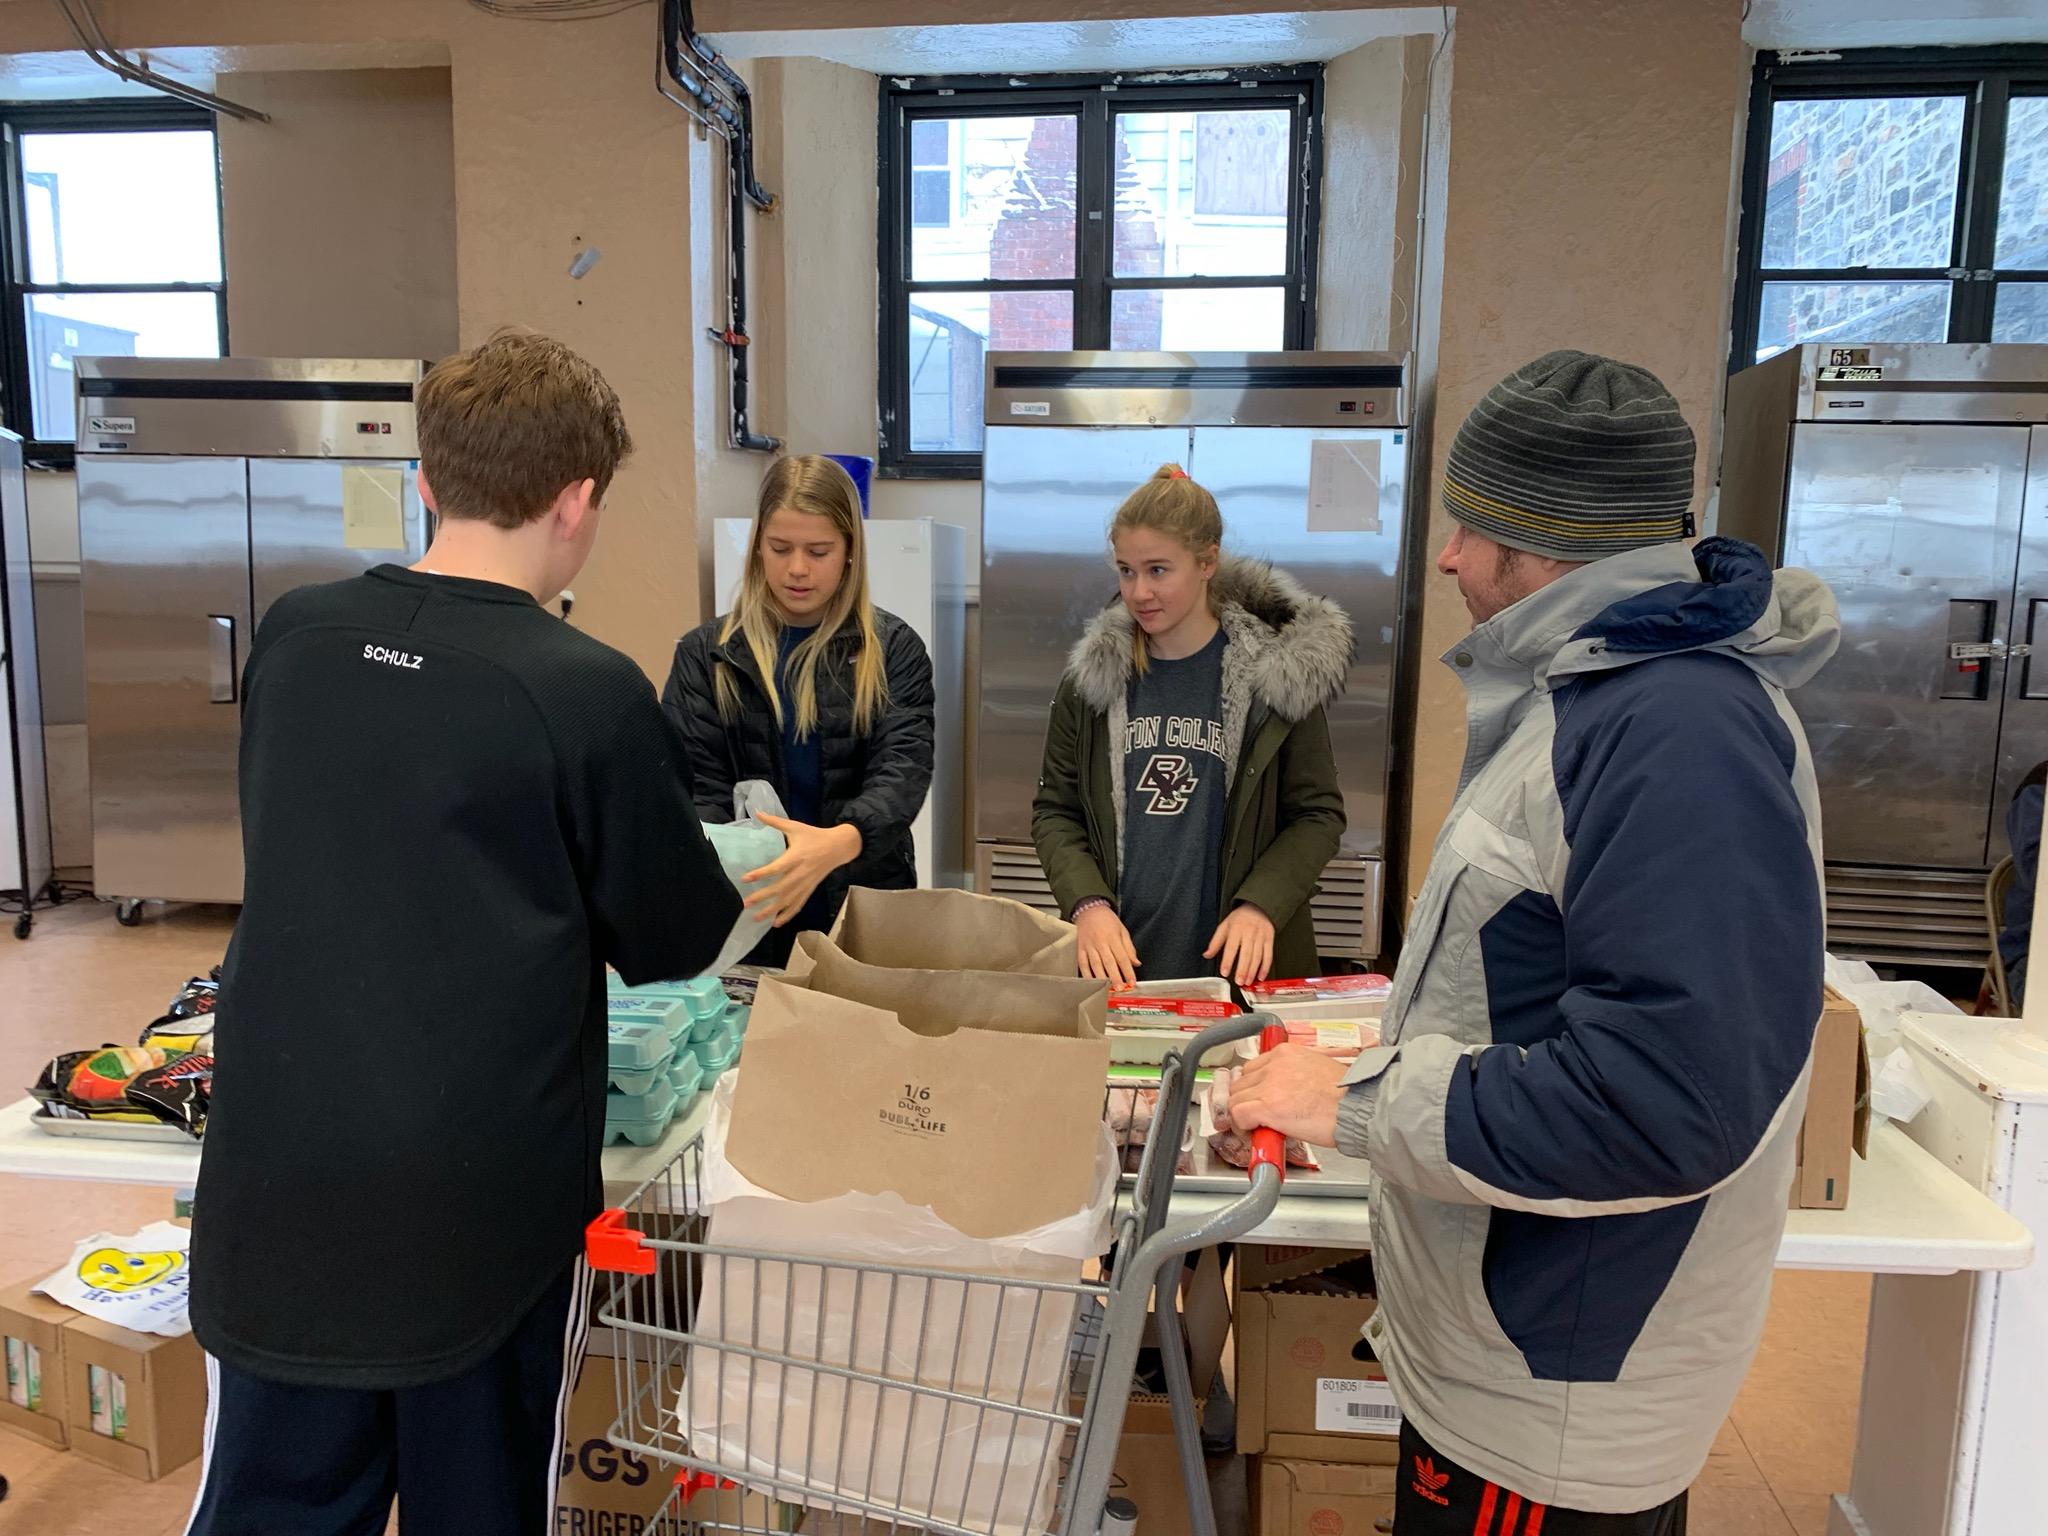 Volunteering to help shop at the CaritasPC choice food pantry.